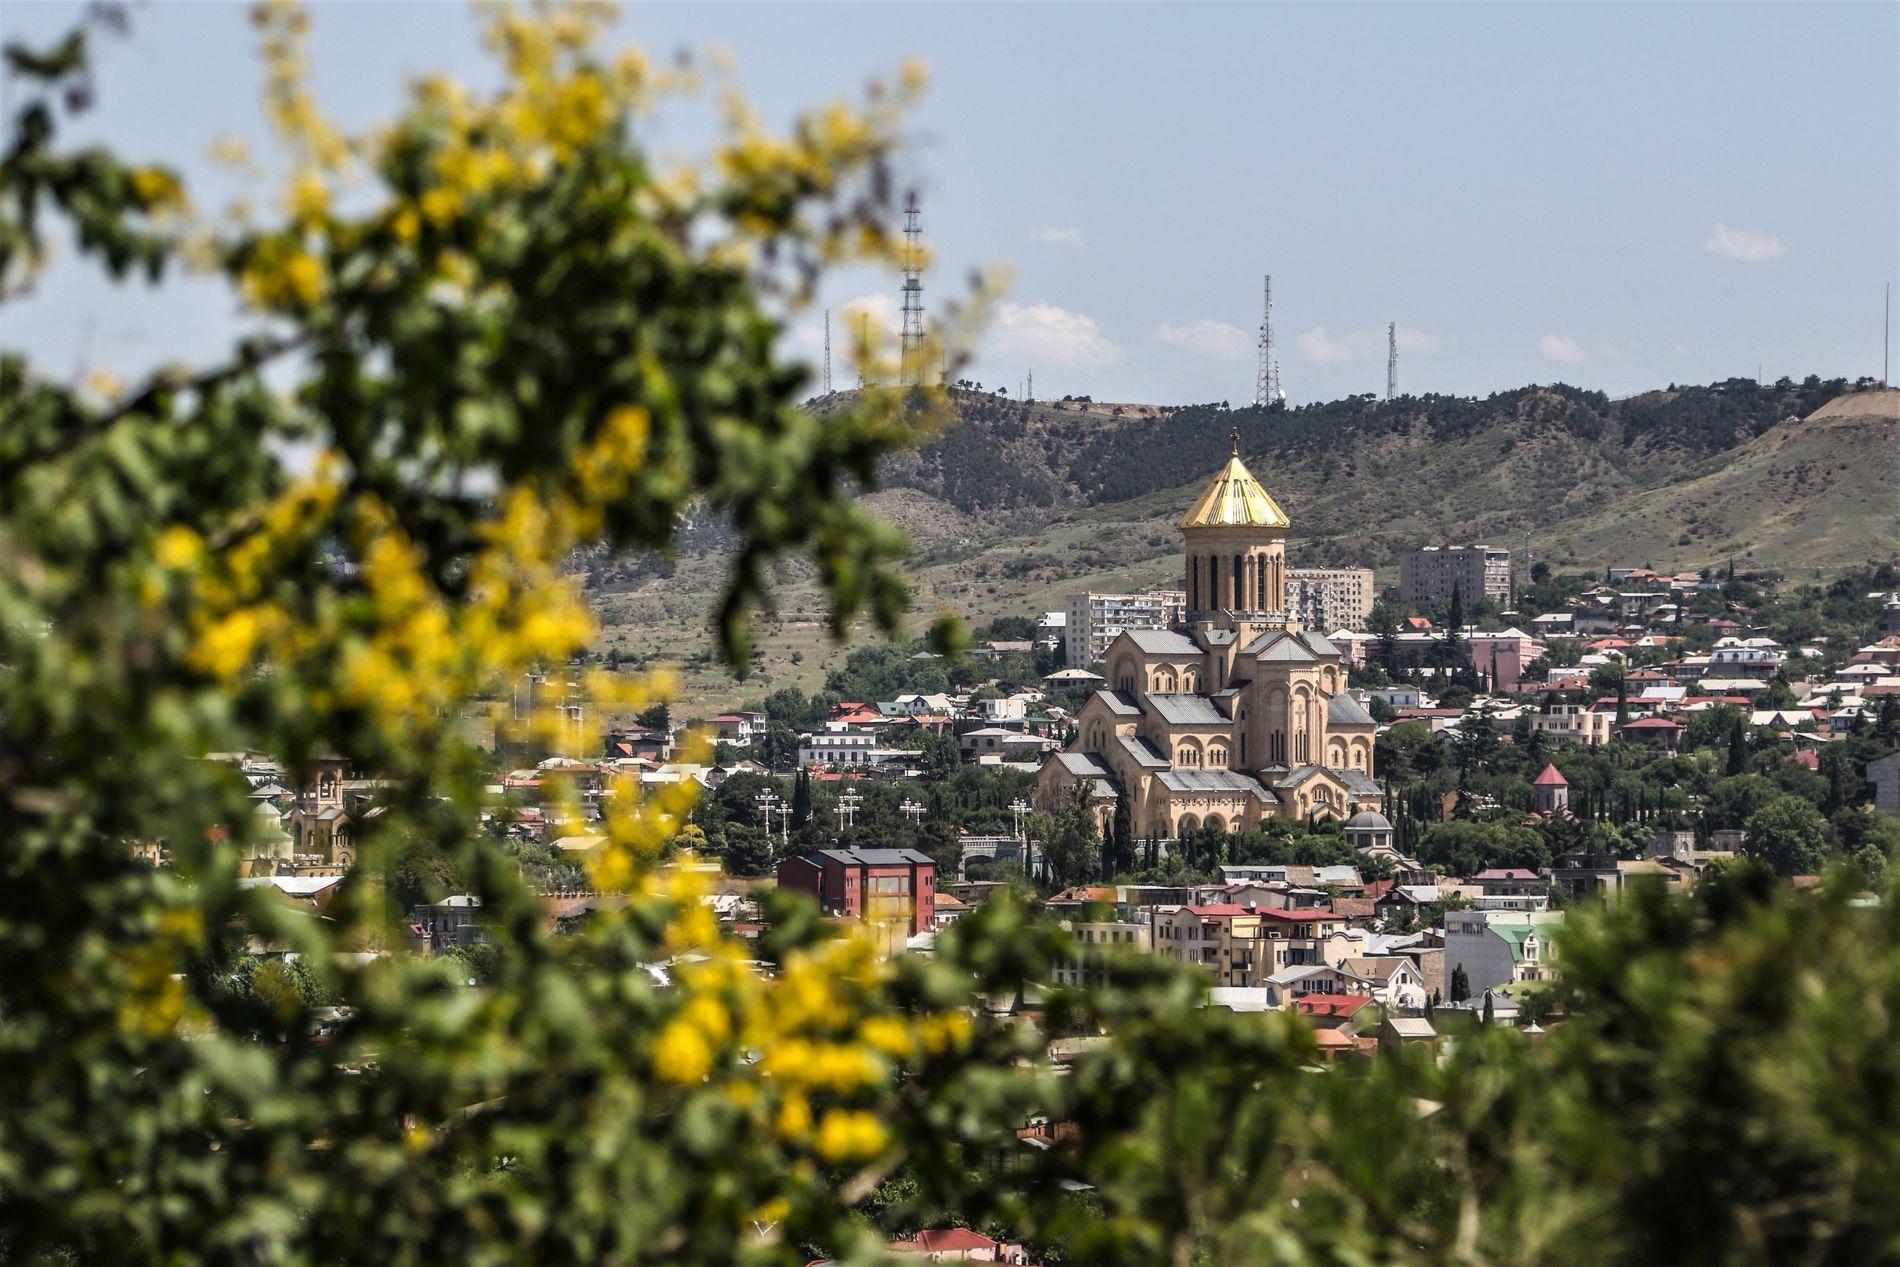 Georgias Hovedstad Tbilisi Er Et Eksotisk Og Annerledes Reisemal En Storby Pa Terskelen Til Den Moderne Verden Her Er Klubbkultur Vi Tbilisi Lanzarote Reise